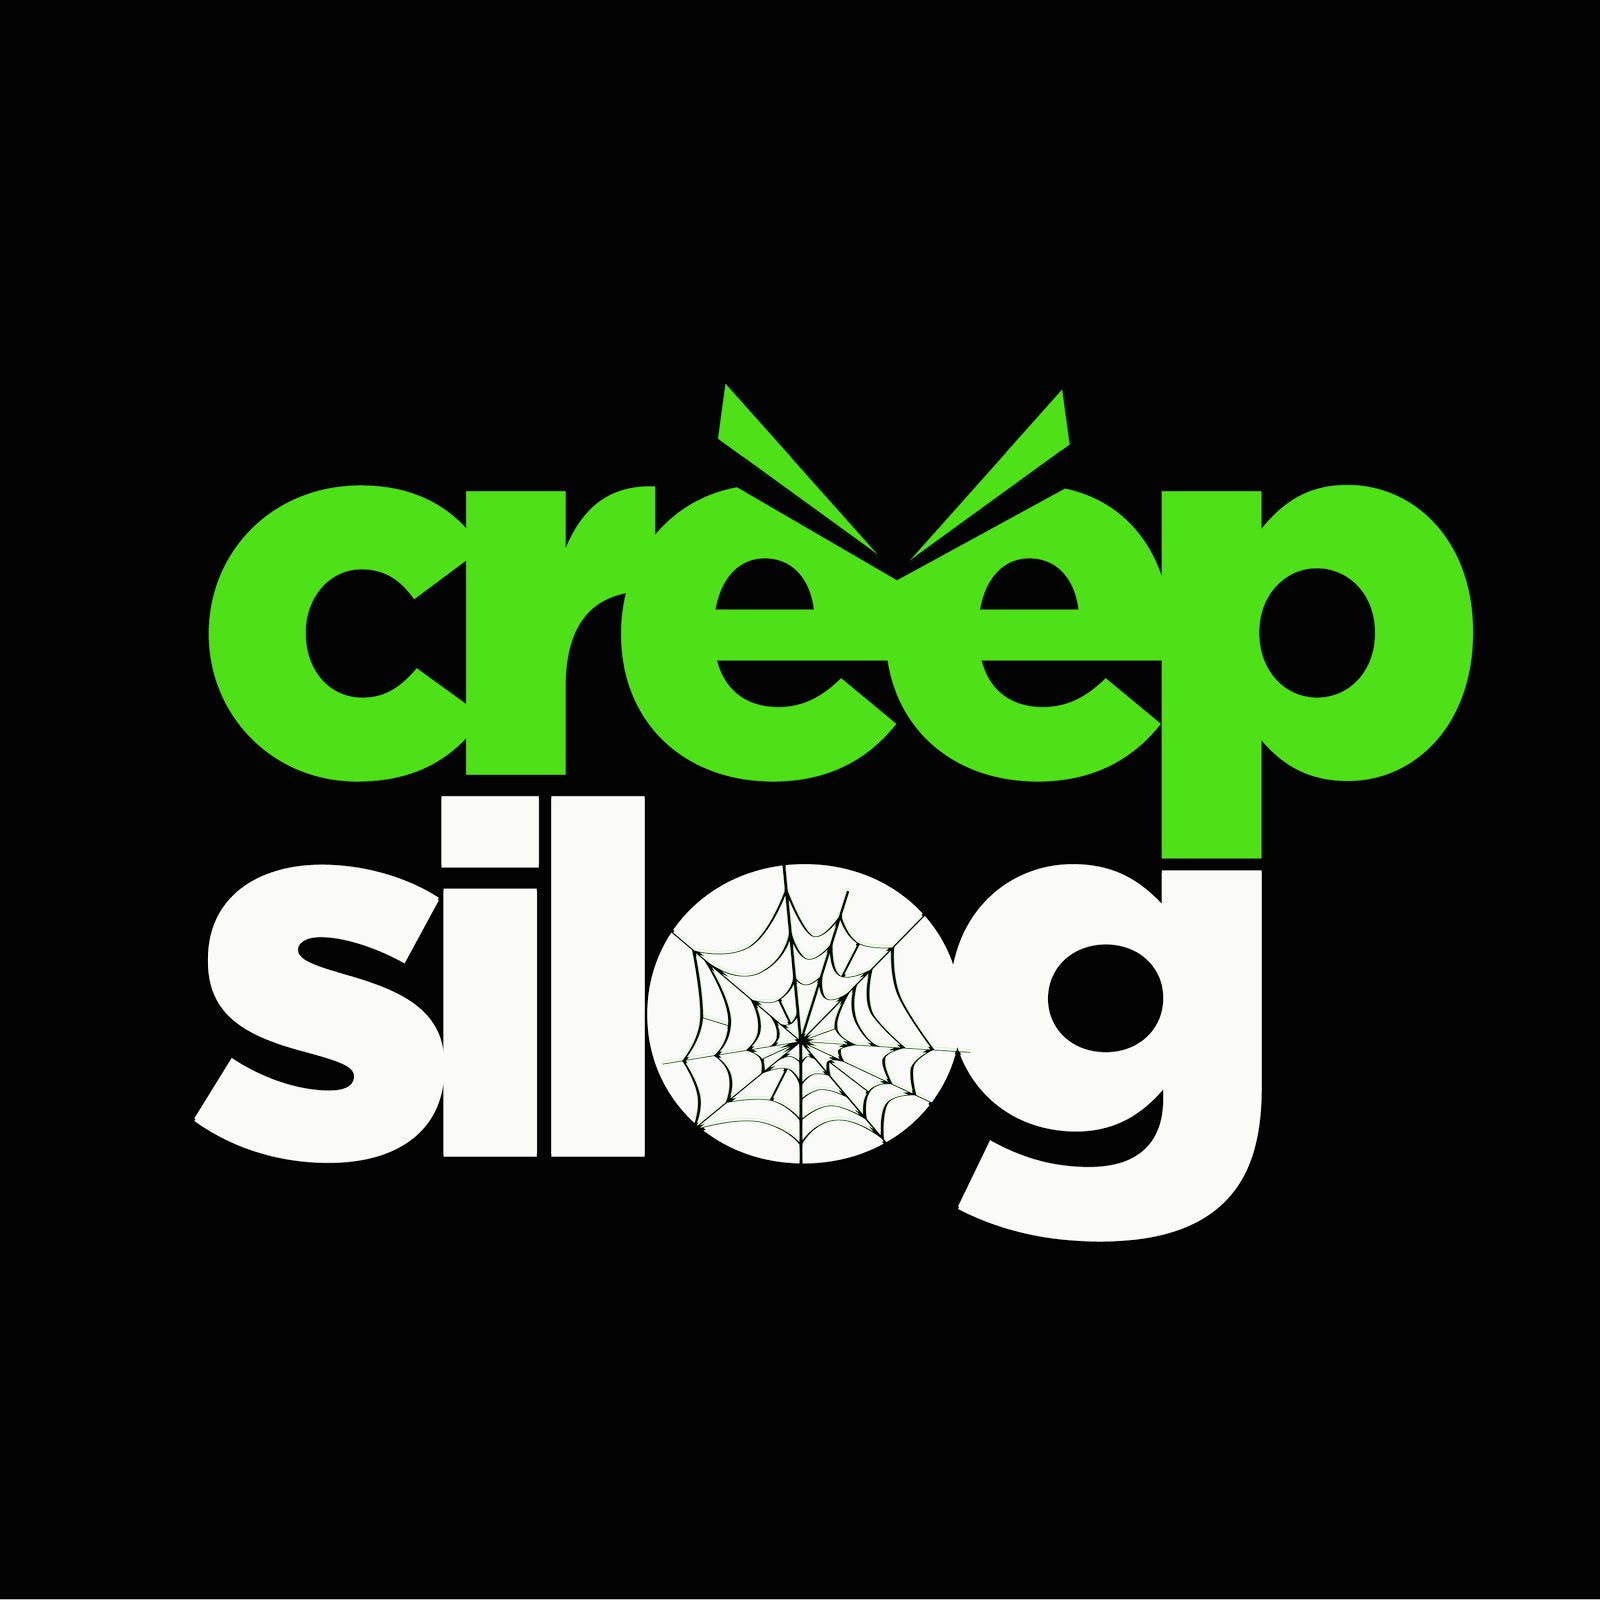 Creepsilog